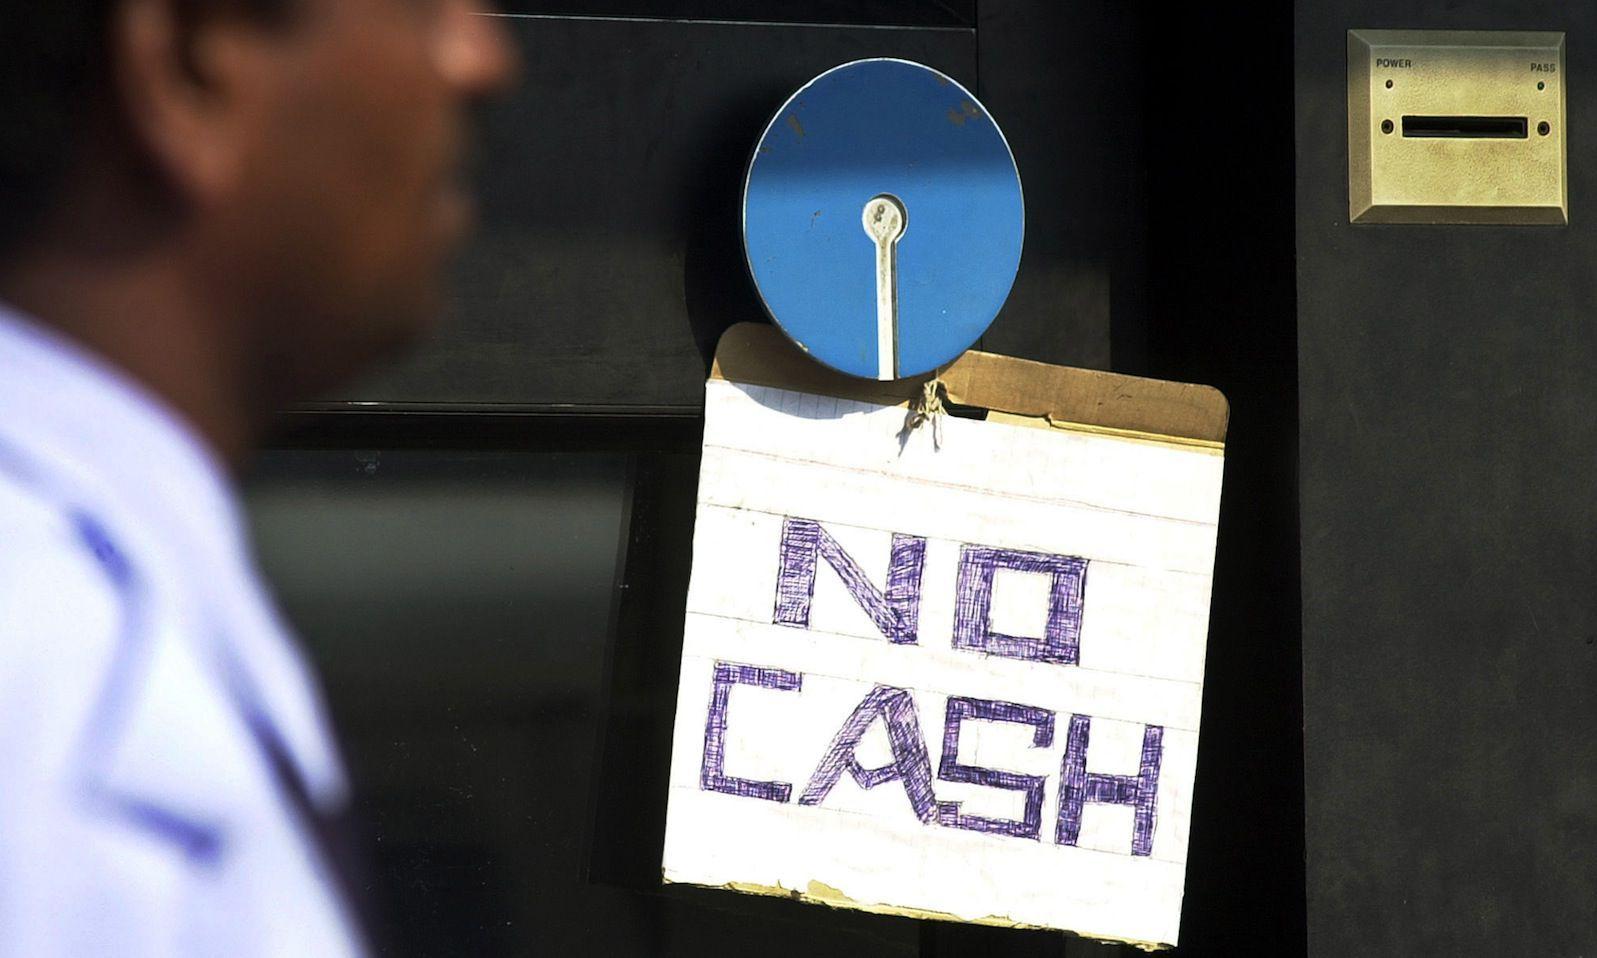 sedelkaos i indien - skylt no cash bankomat